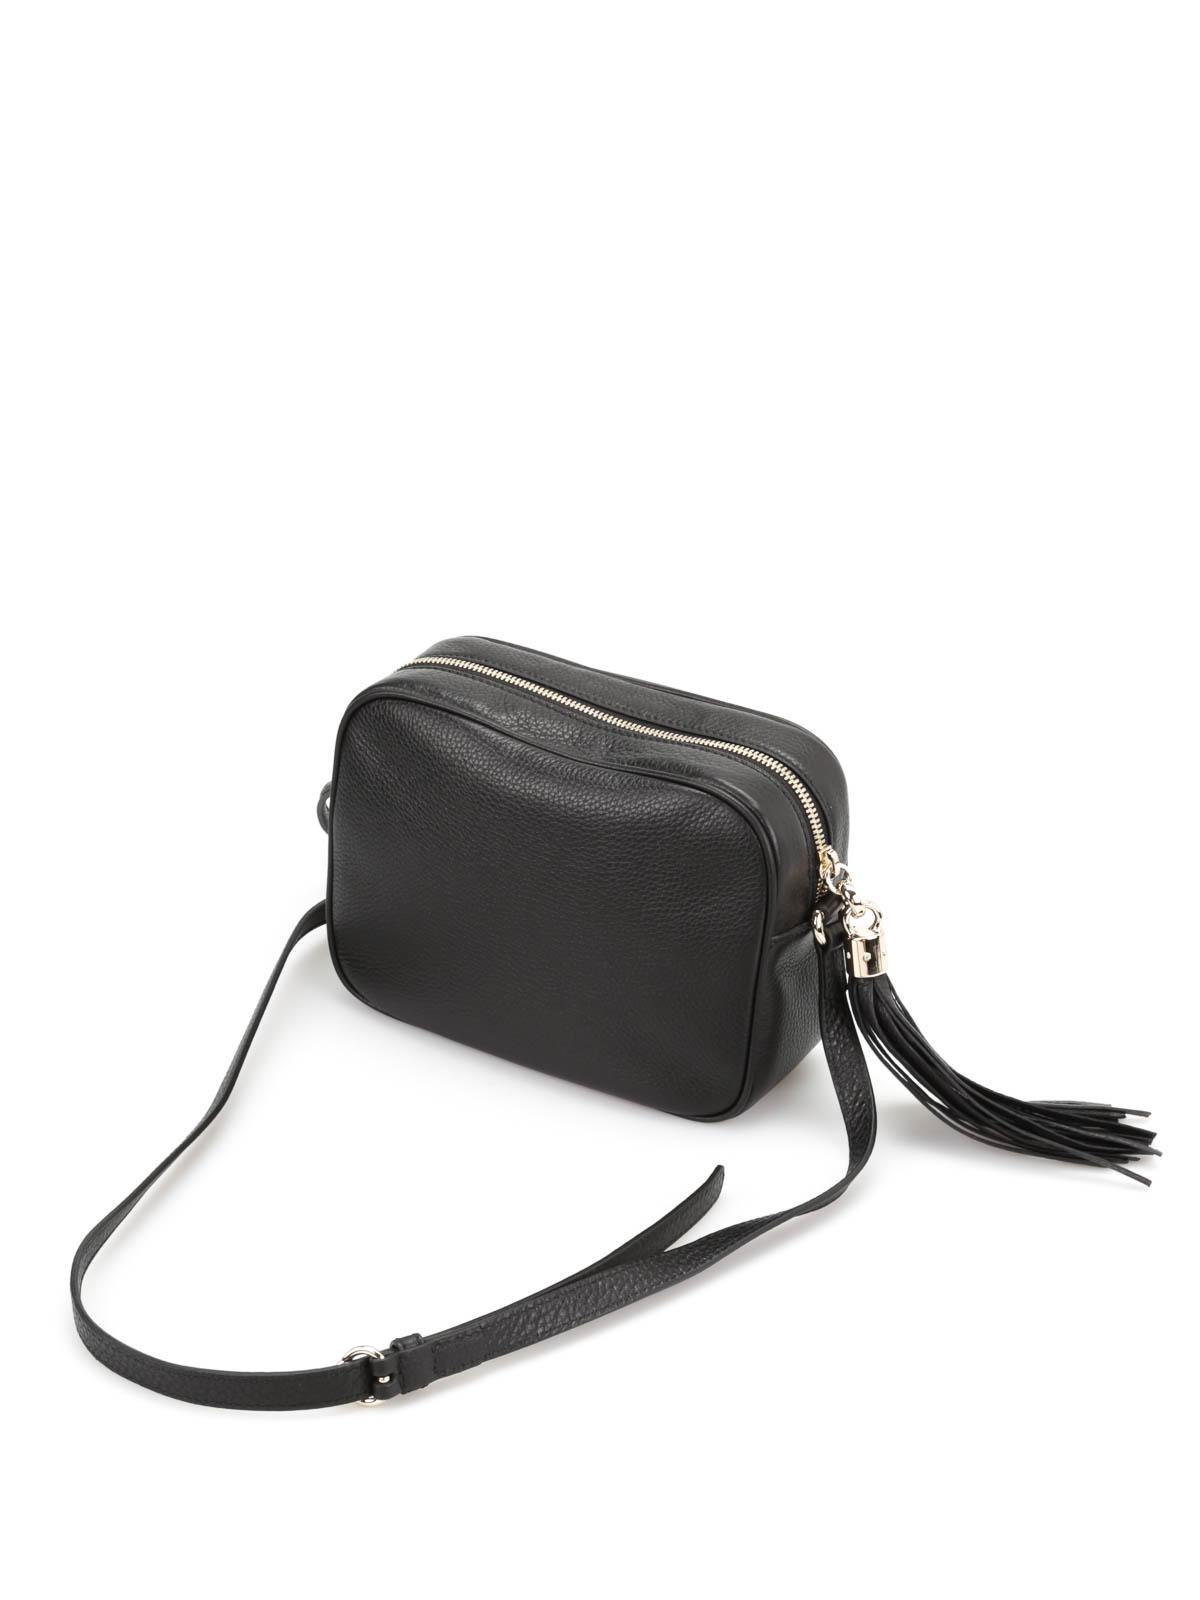 replica bottega veneta handbags wallet cell signaling